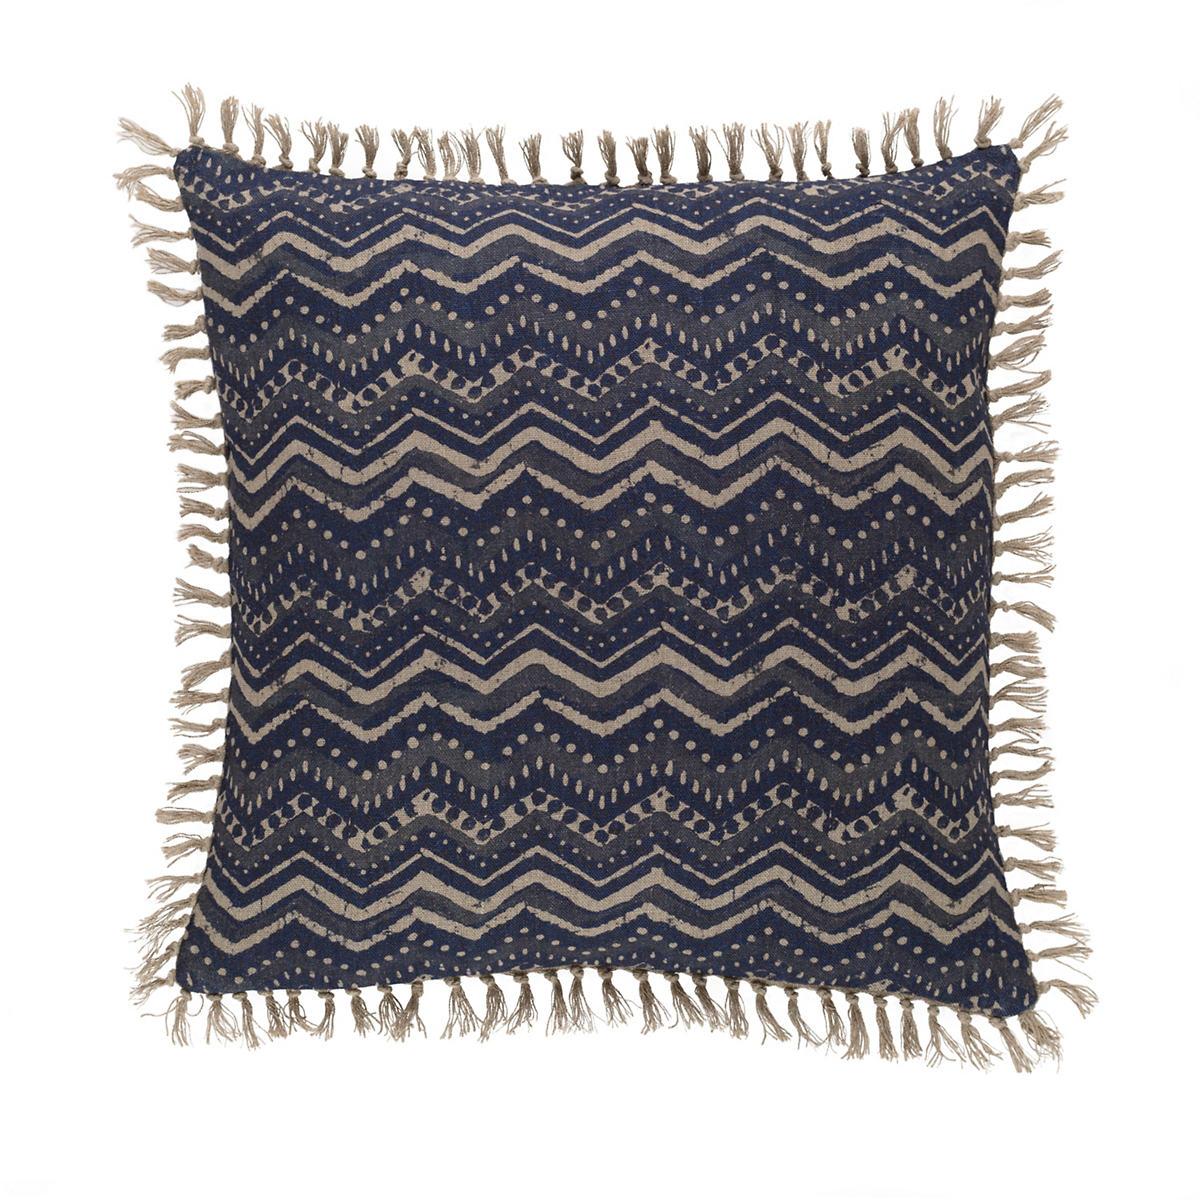 Marianna Linen Greek Key/Chevron Decorative Pillow